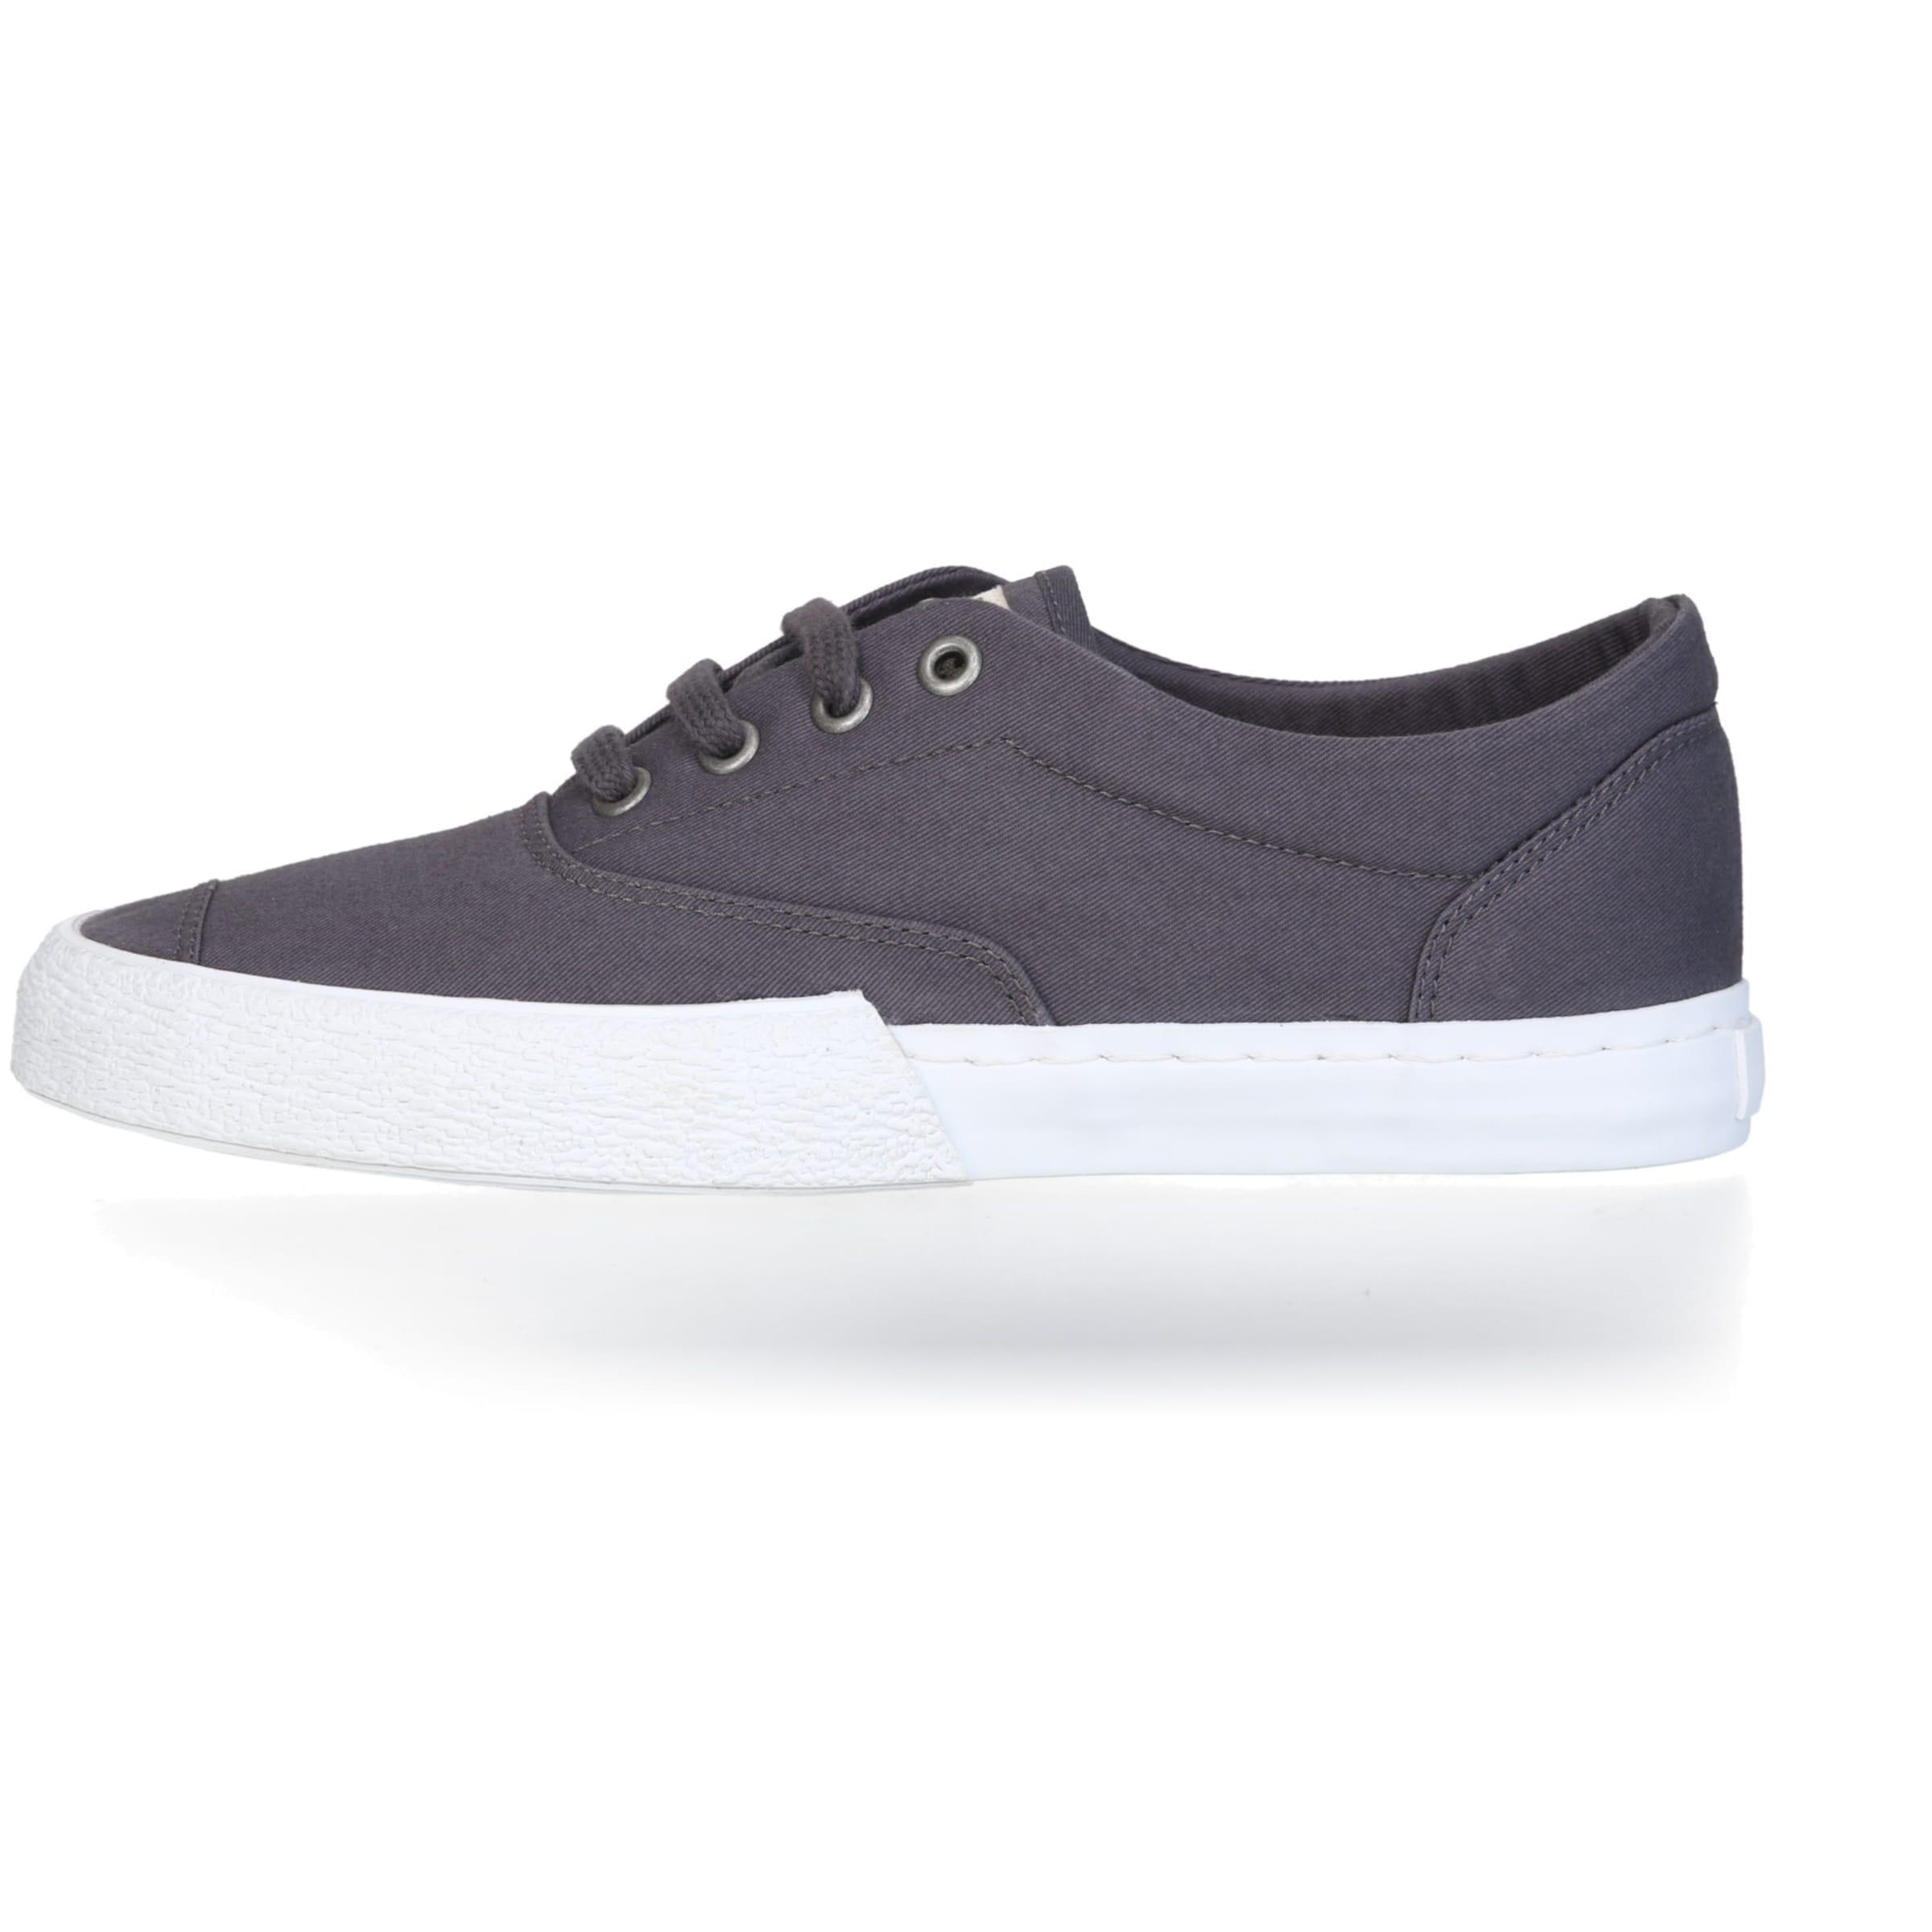 Ethletic Sneaker In Basaltgrau 'randall' qpGzMSVU